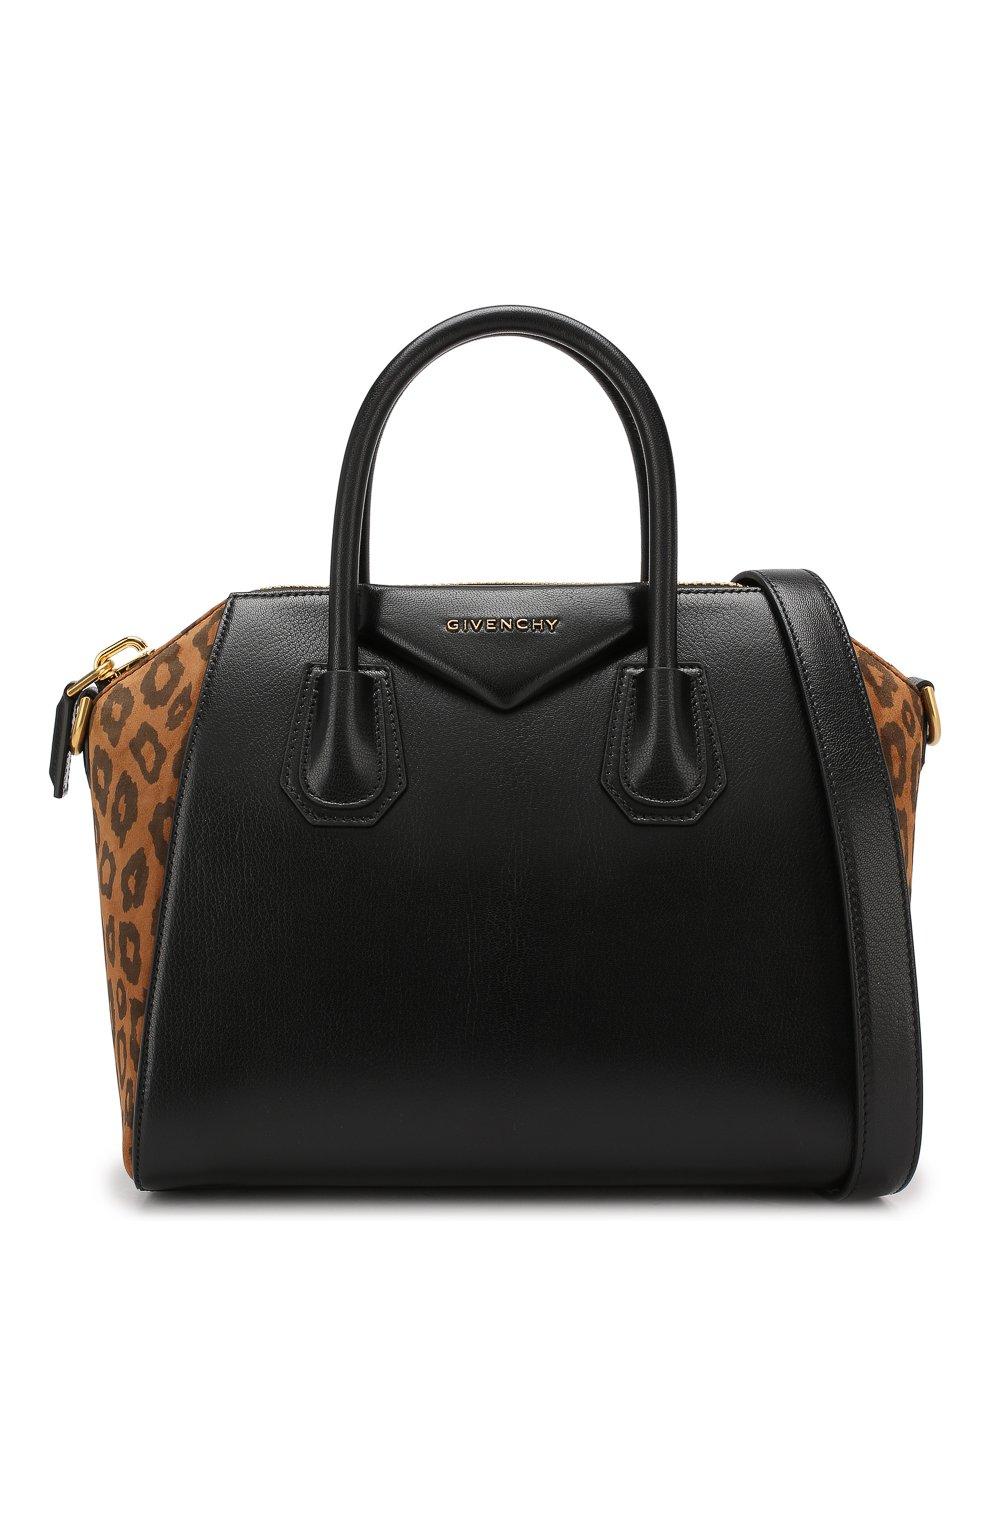 Сумка Antigona small Givenchy черная цвета | Фото №6